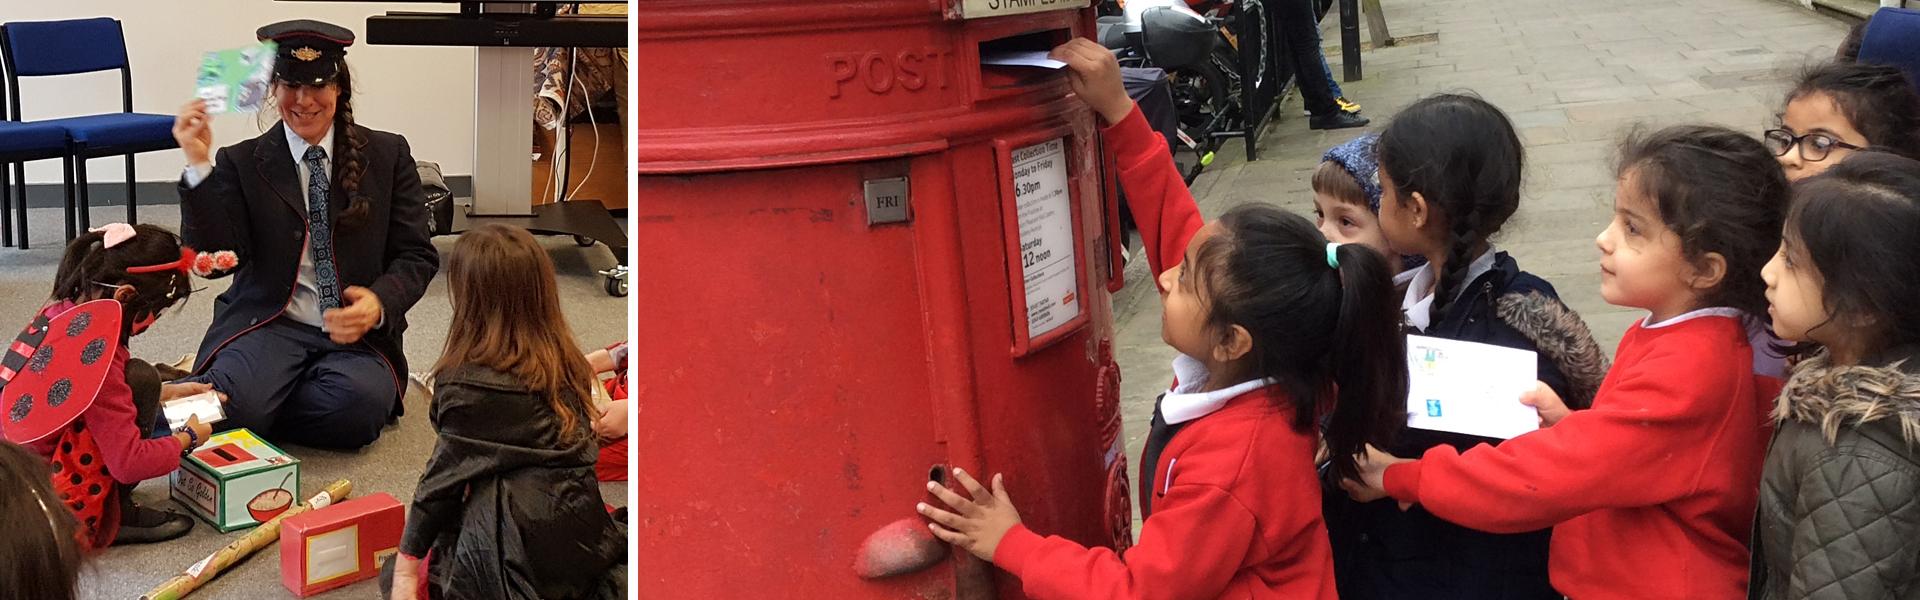 Jolly Postman Gallery 3